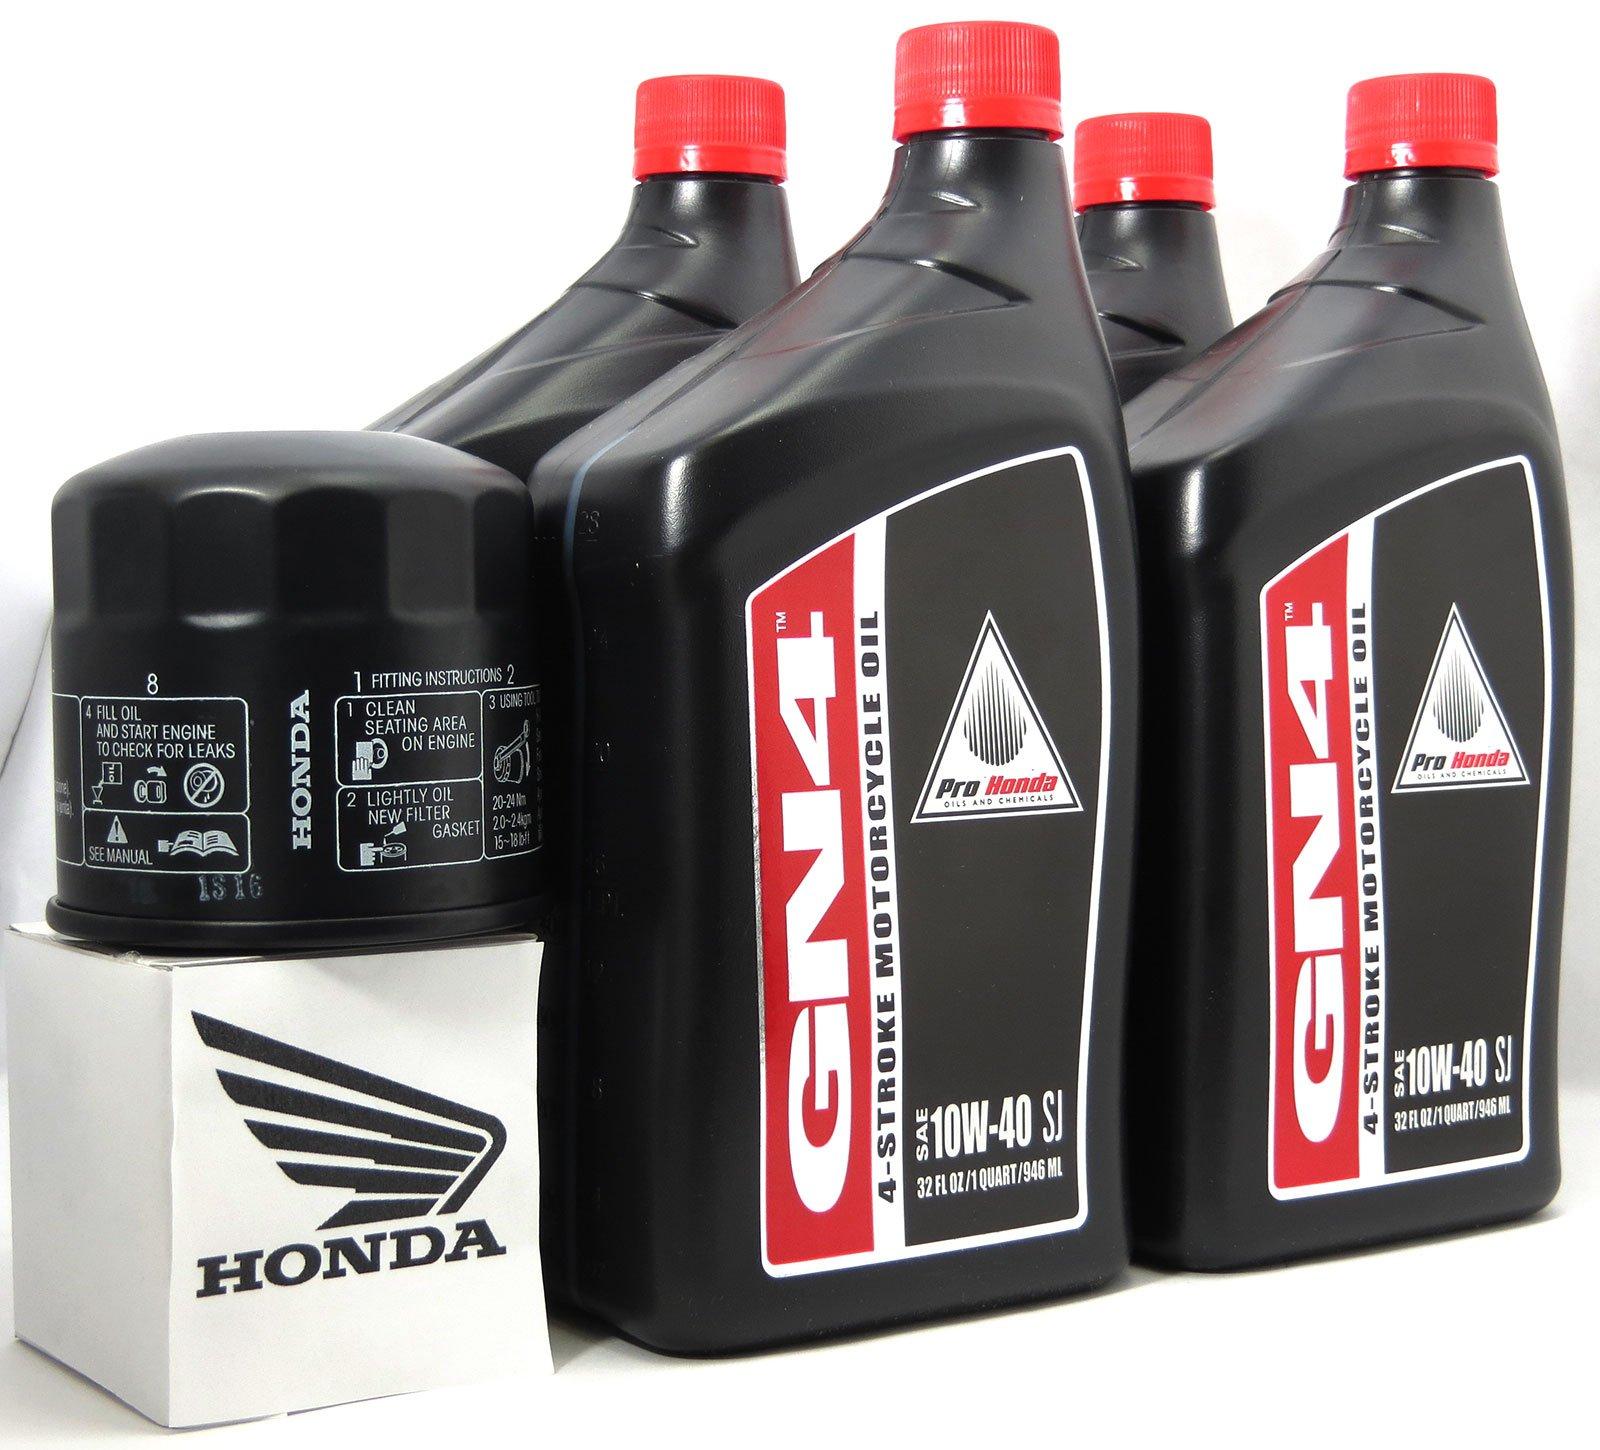 1983 Honda Vf1100C V65 Magna Oil Change Kit With Shaft Drive Fluid